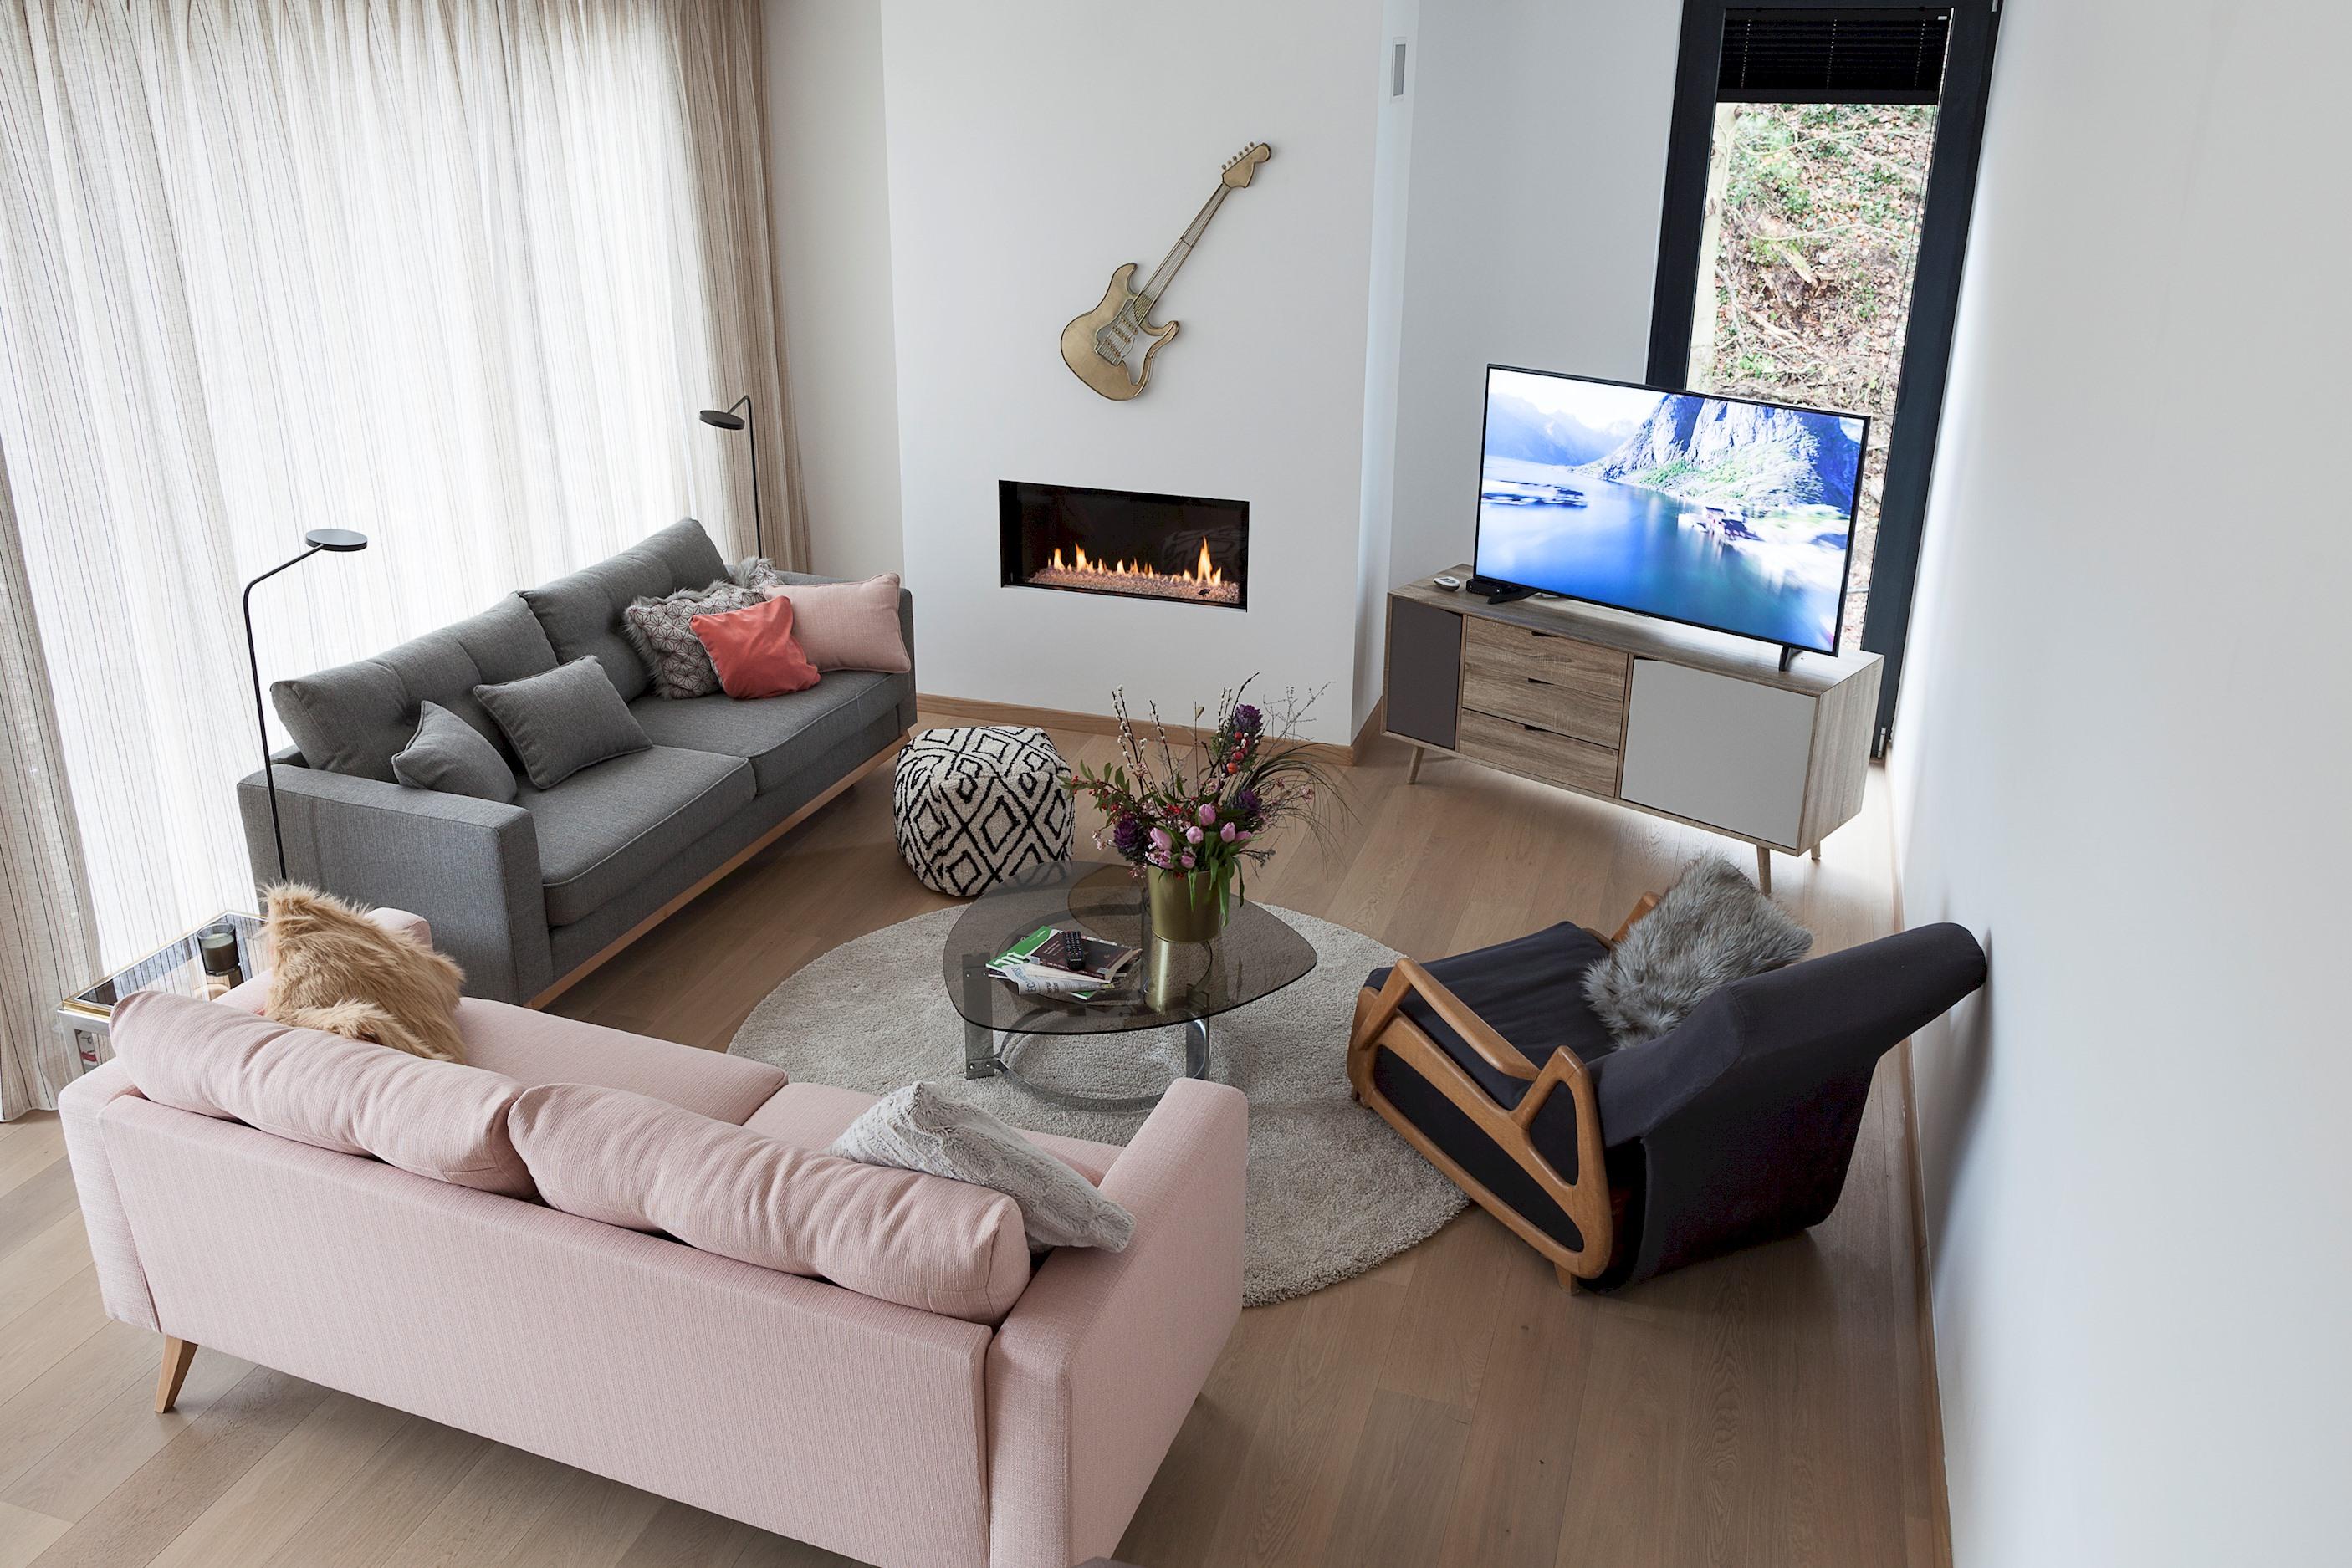 Unit 2 - Modern Smart Home Duplex with free Parking 2